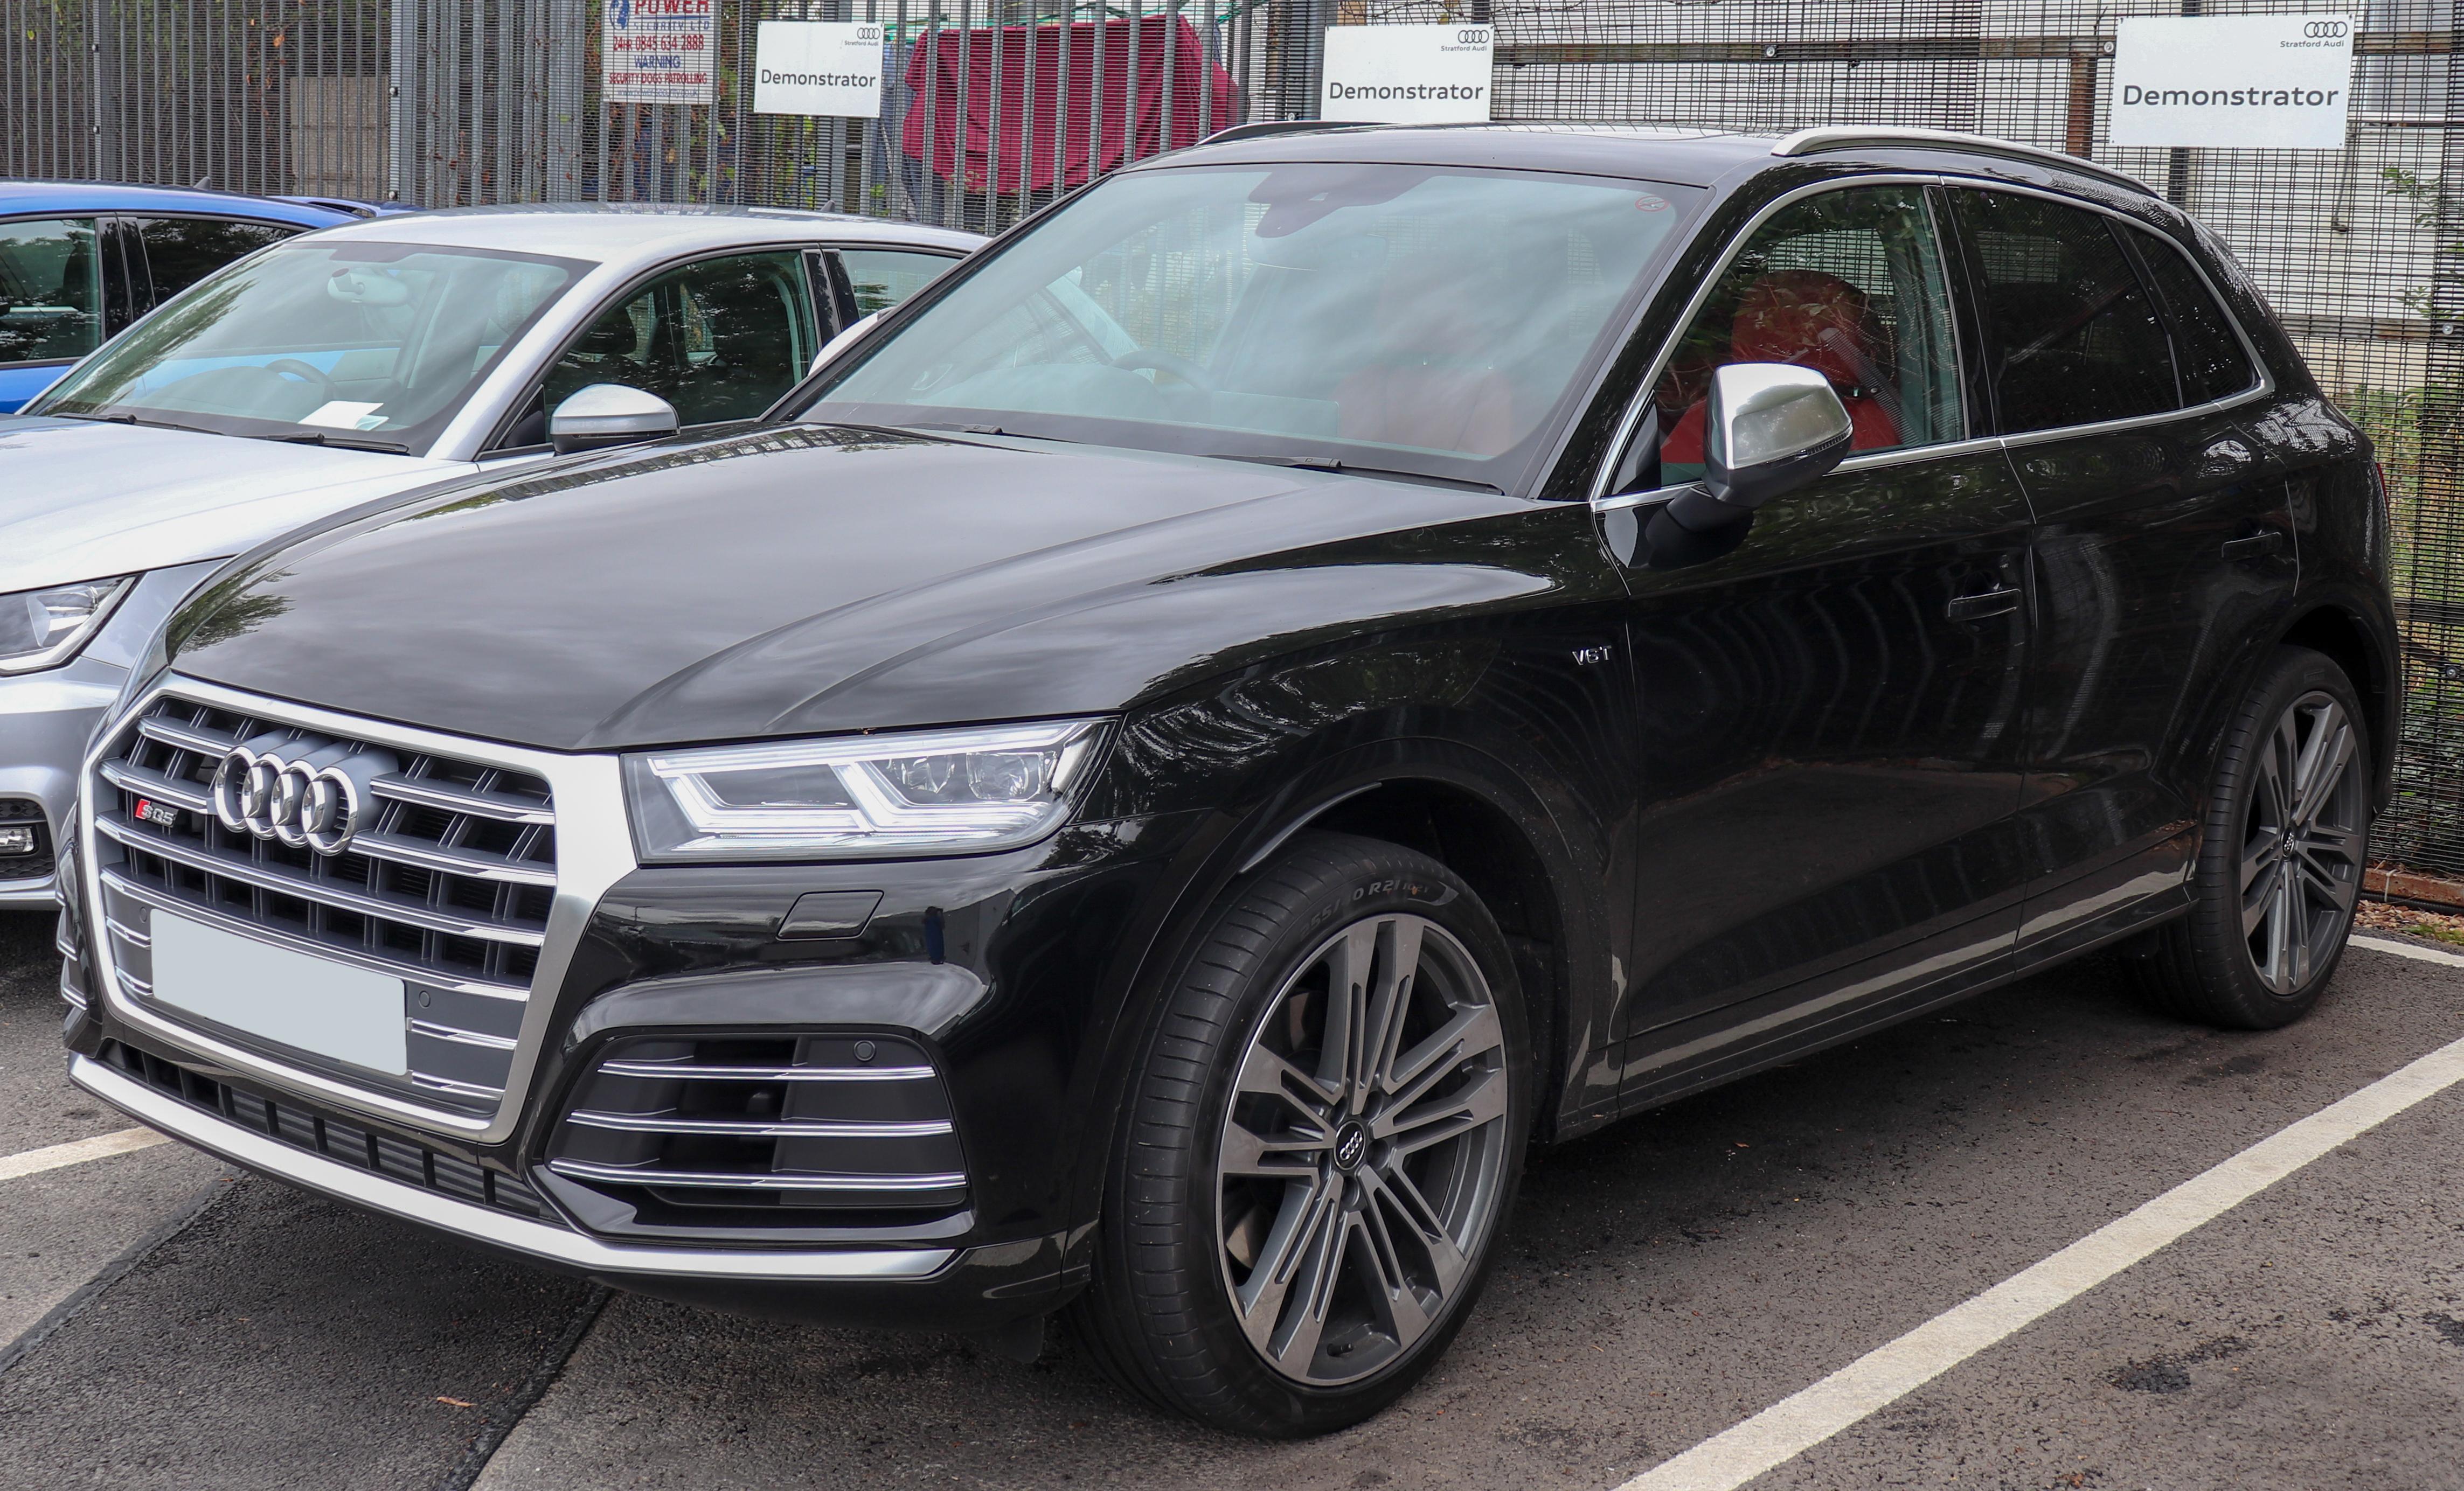 Kekurangan Audi Sq5 2018 Harga